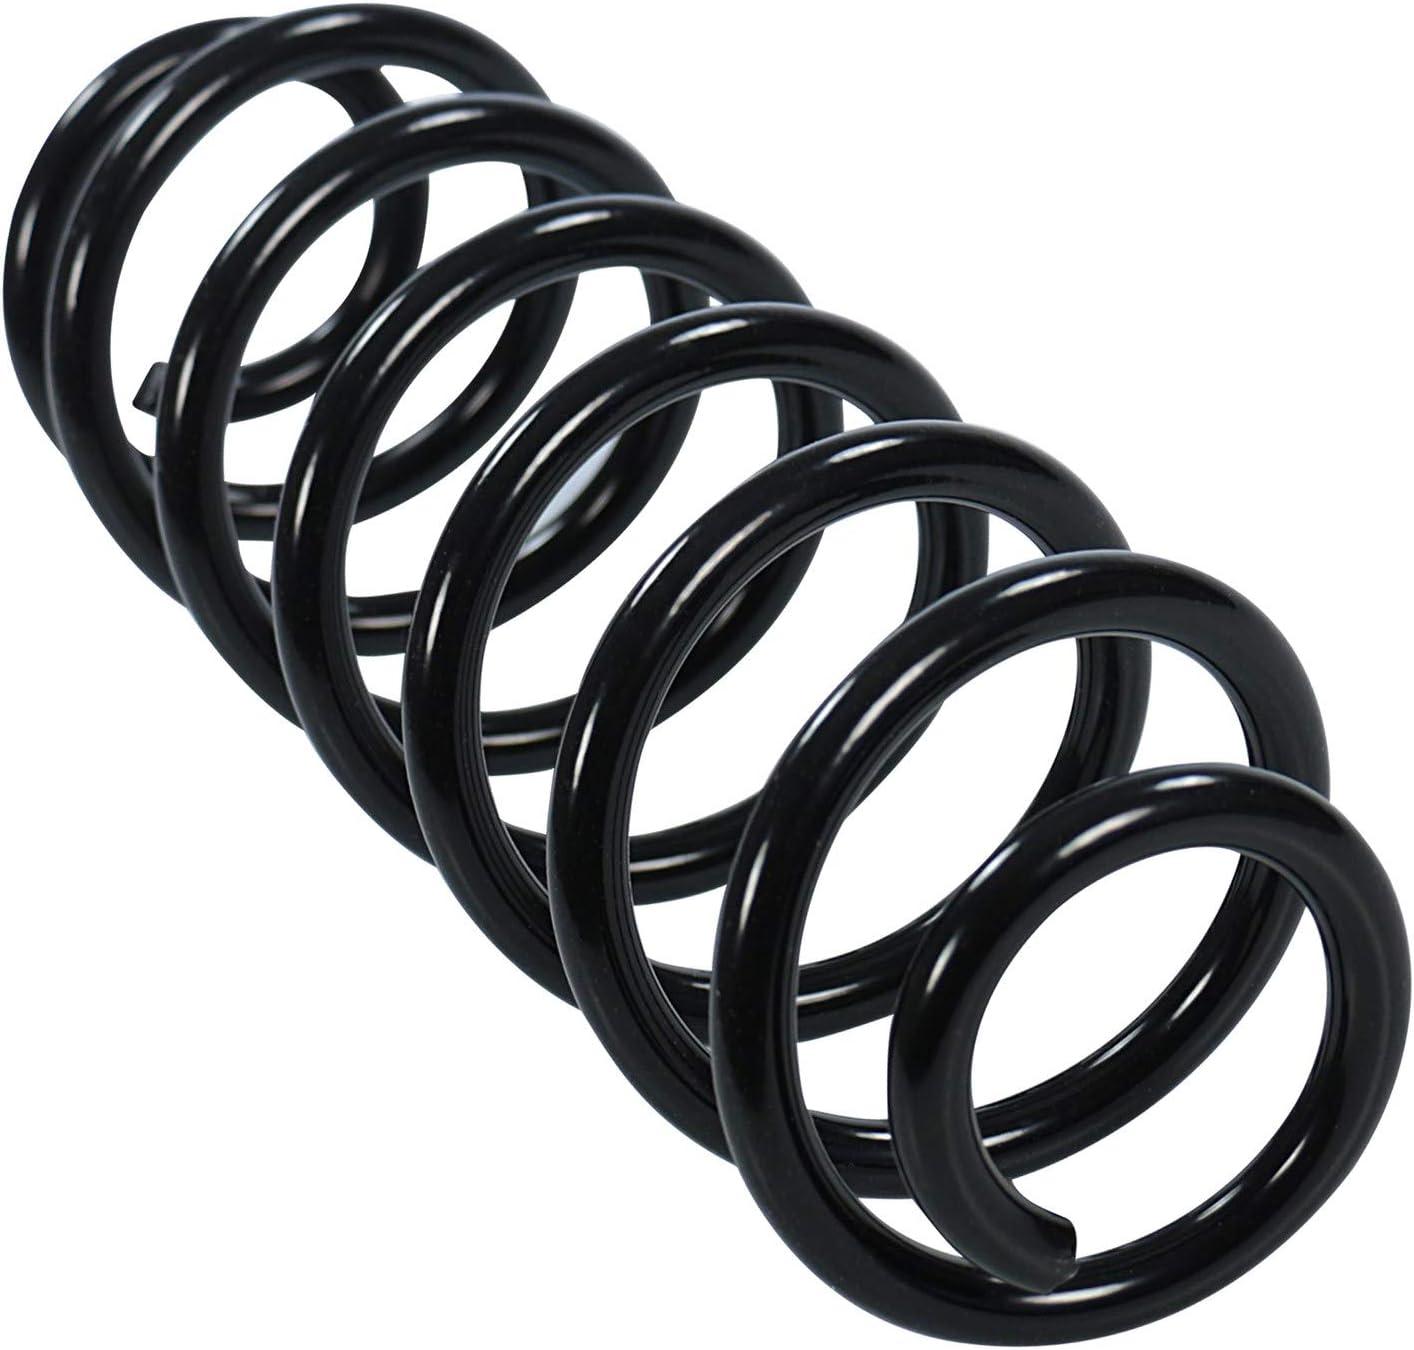 2x Bilstein Feder Fahrwerksfeder Federn Fahrwerksfedern Spiralfeder Spiralfedern Hinten Auto